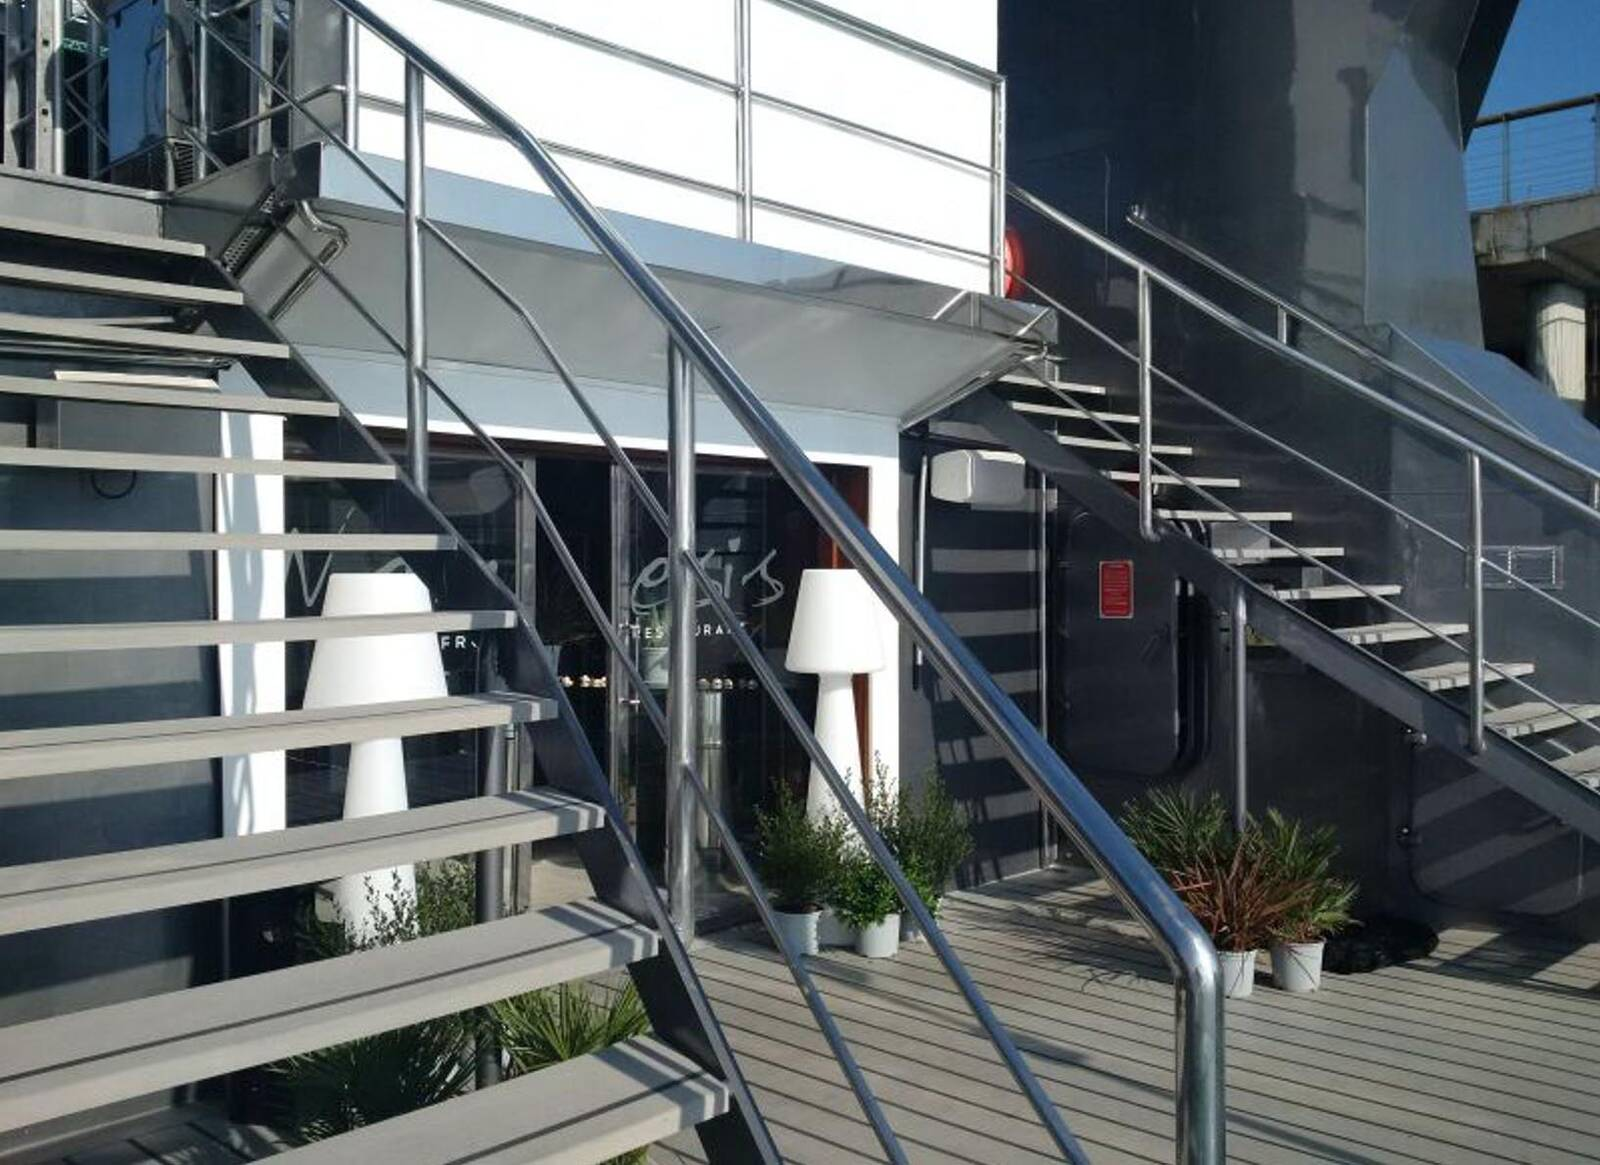 Steps Restaurant Club Ship Disco Boat For Sale